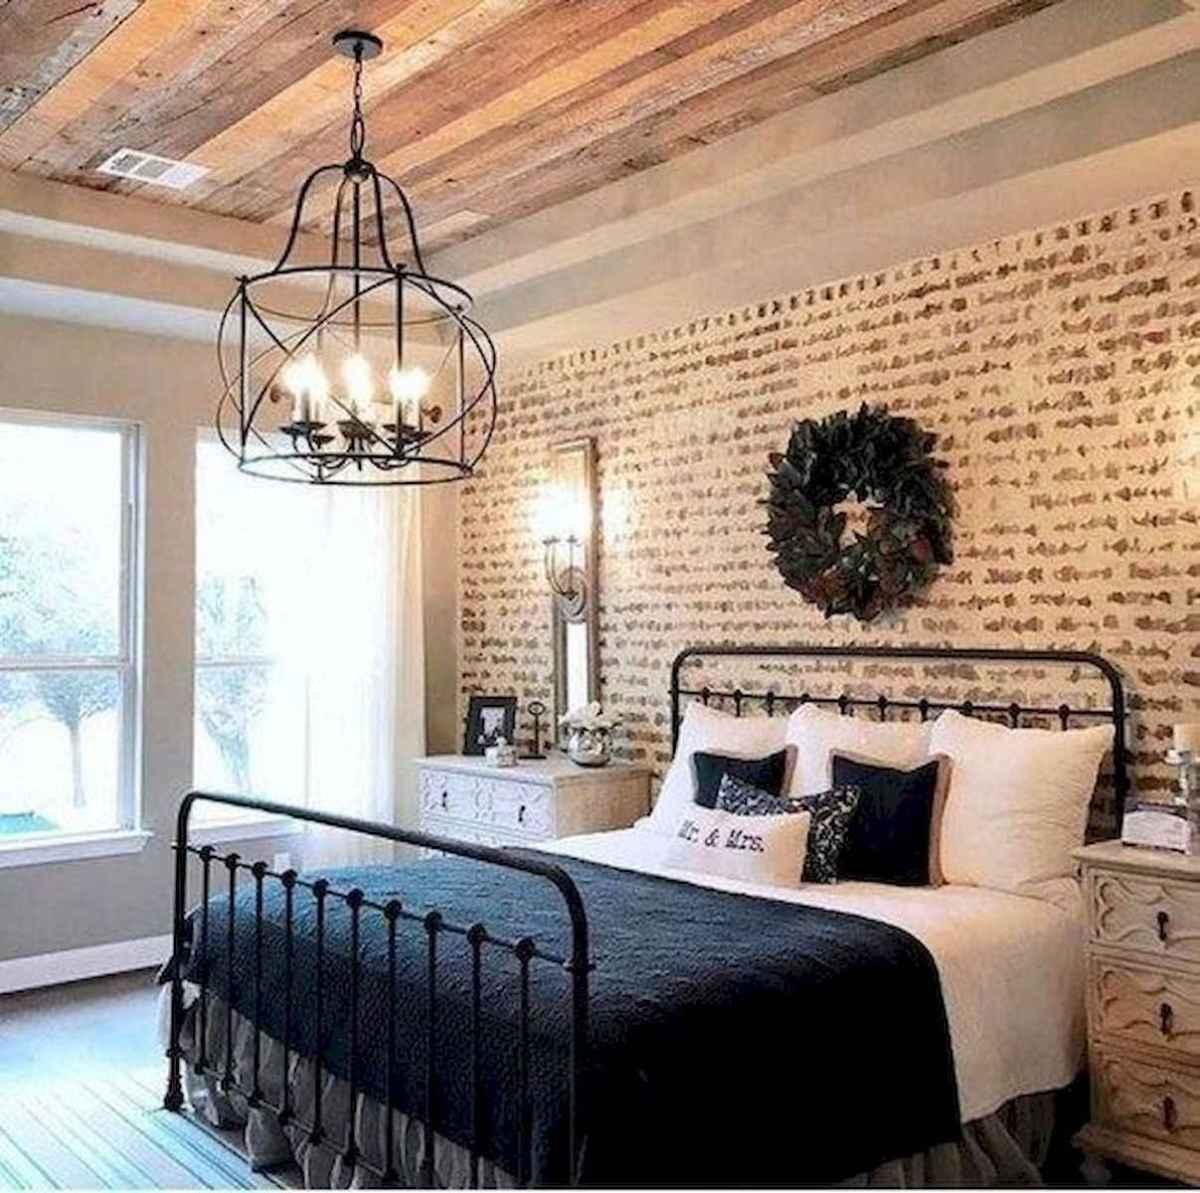 50 Favorite Bedding for Farmhouse Bedroom Design Ideas and Decor (39)